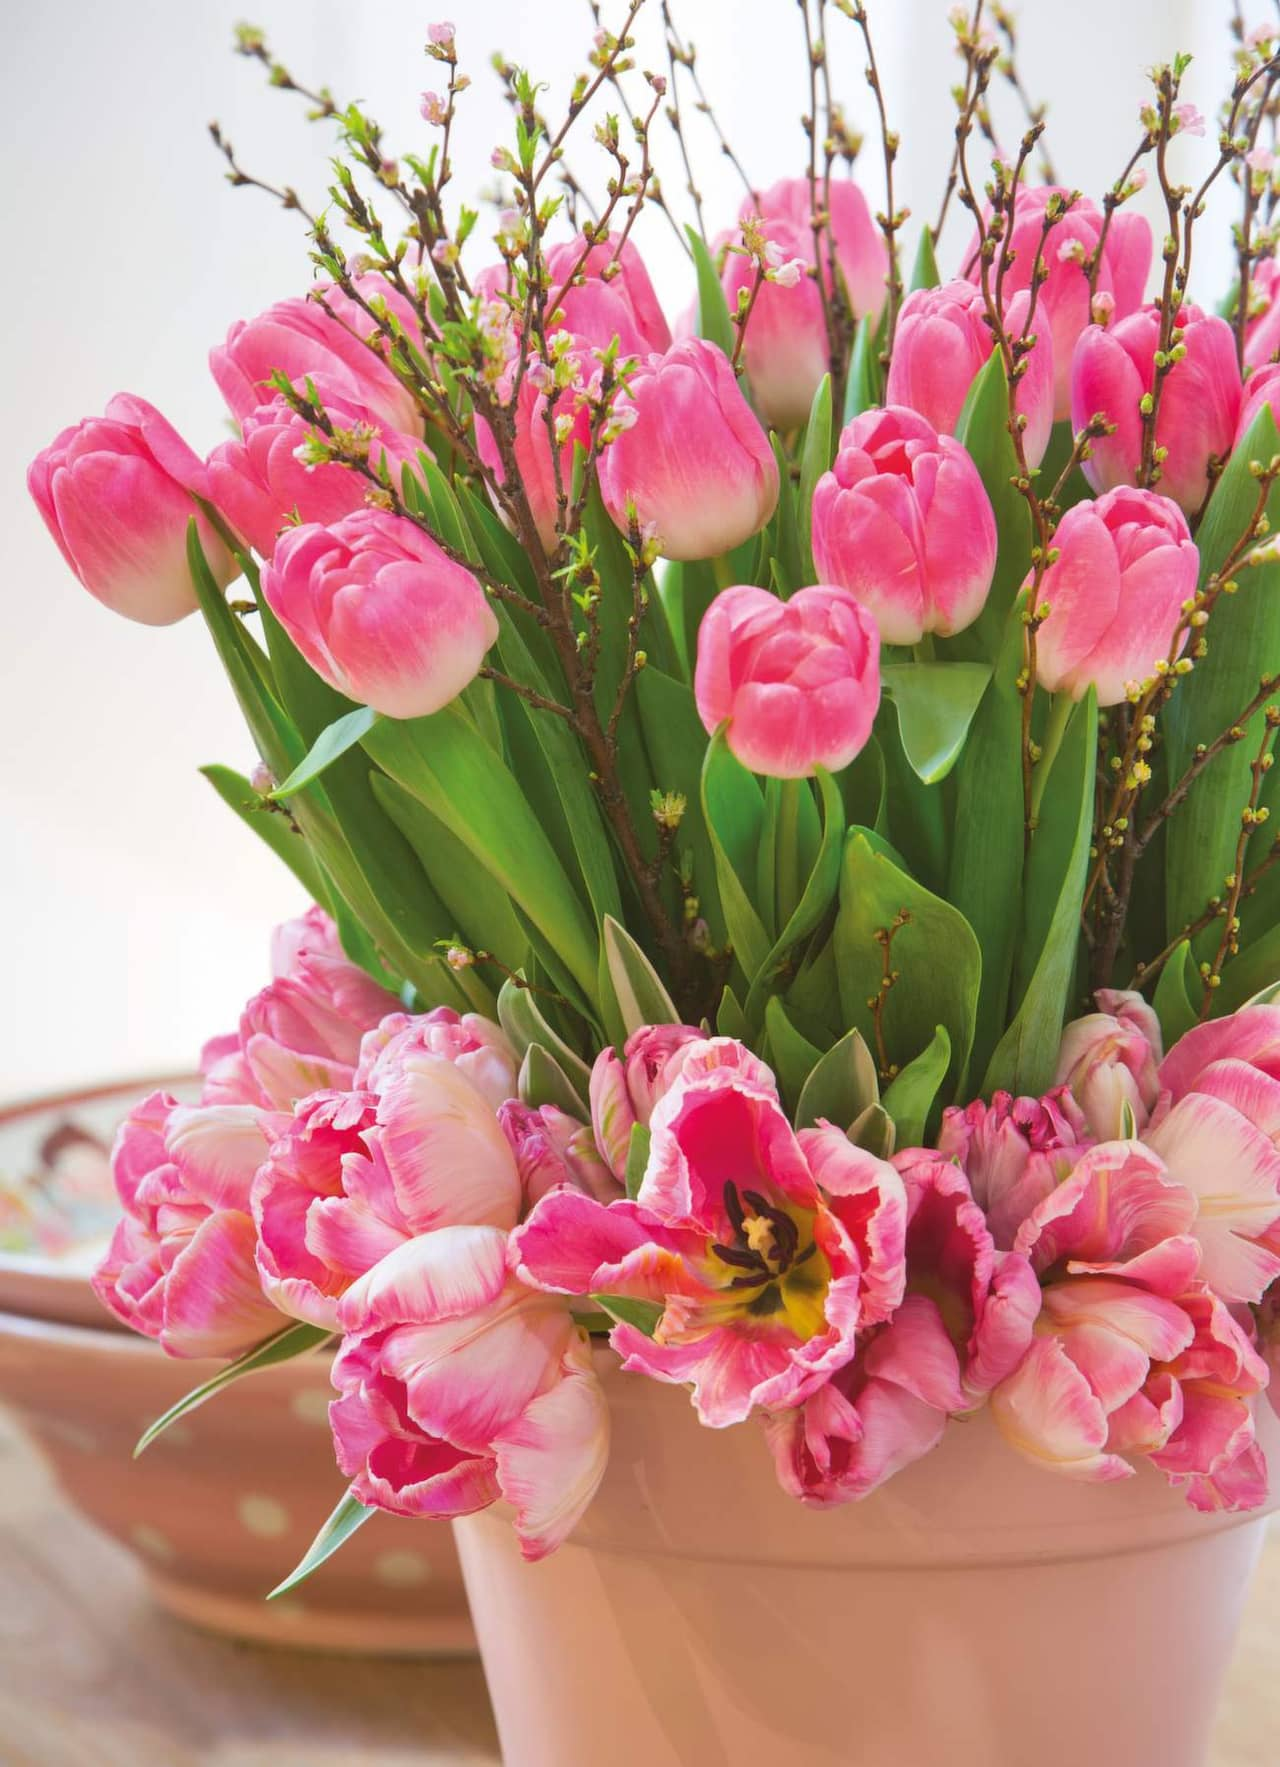 7 blommor betyder